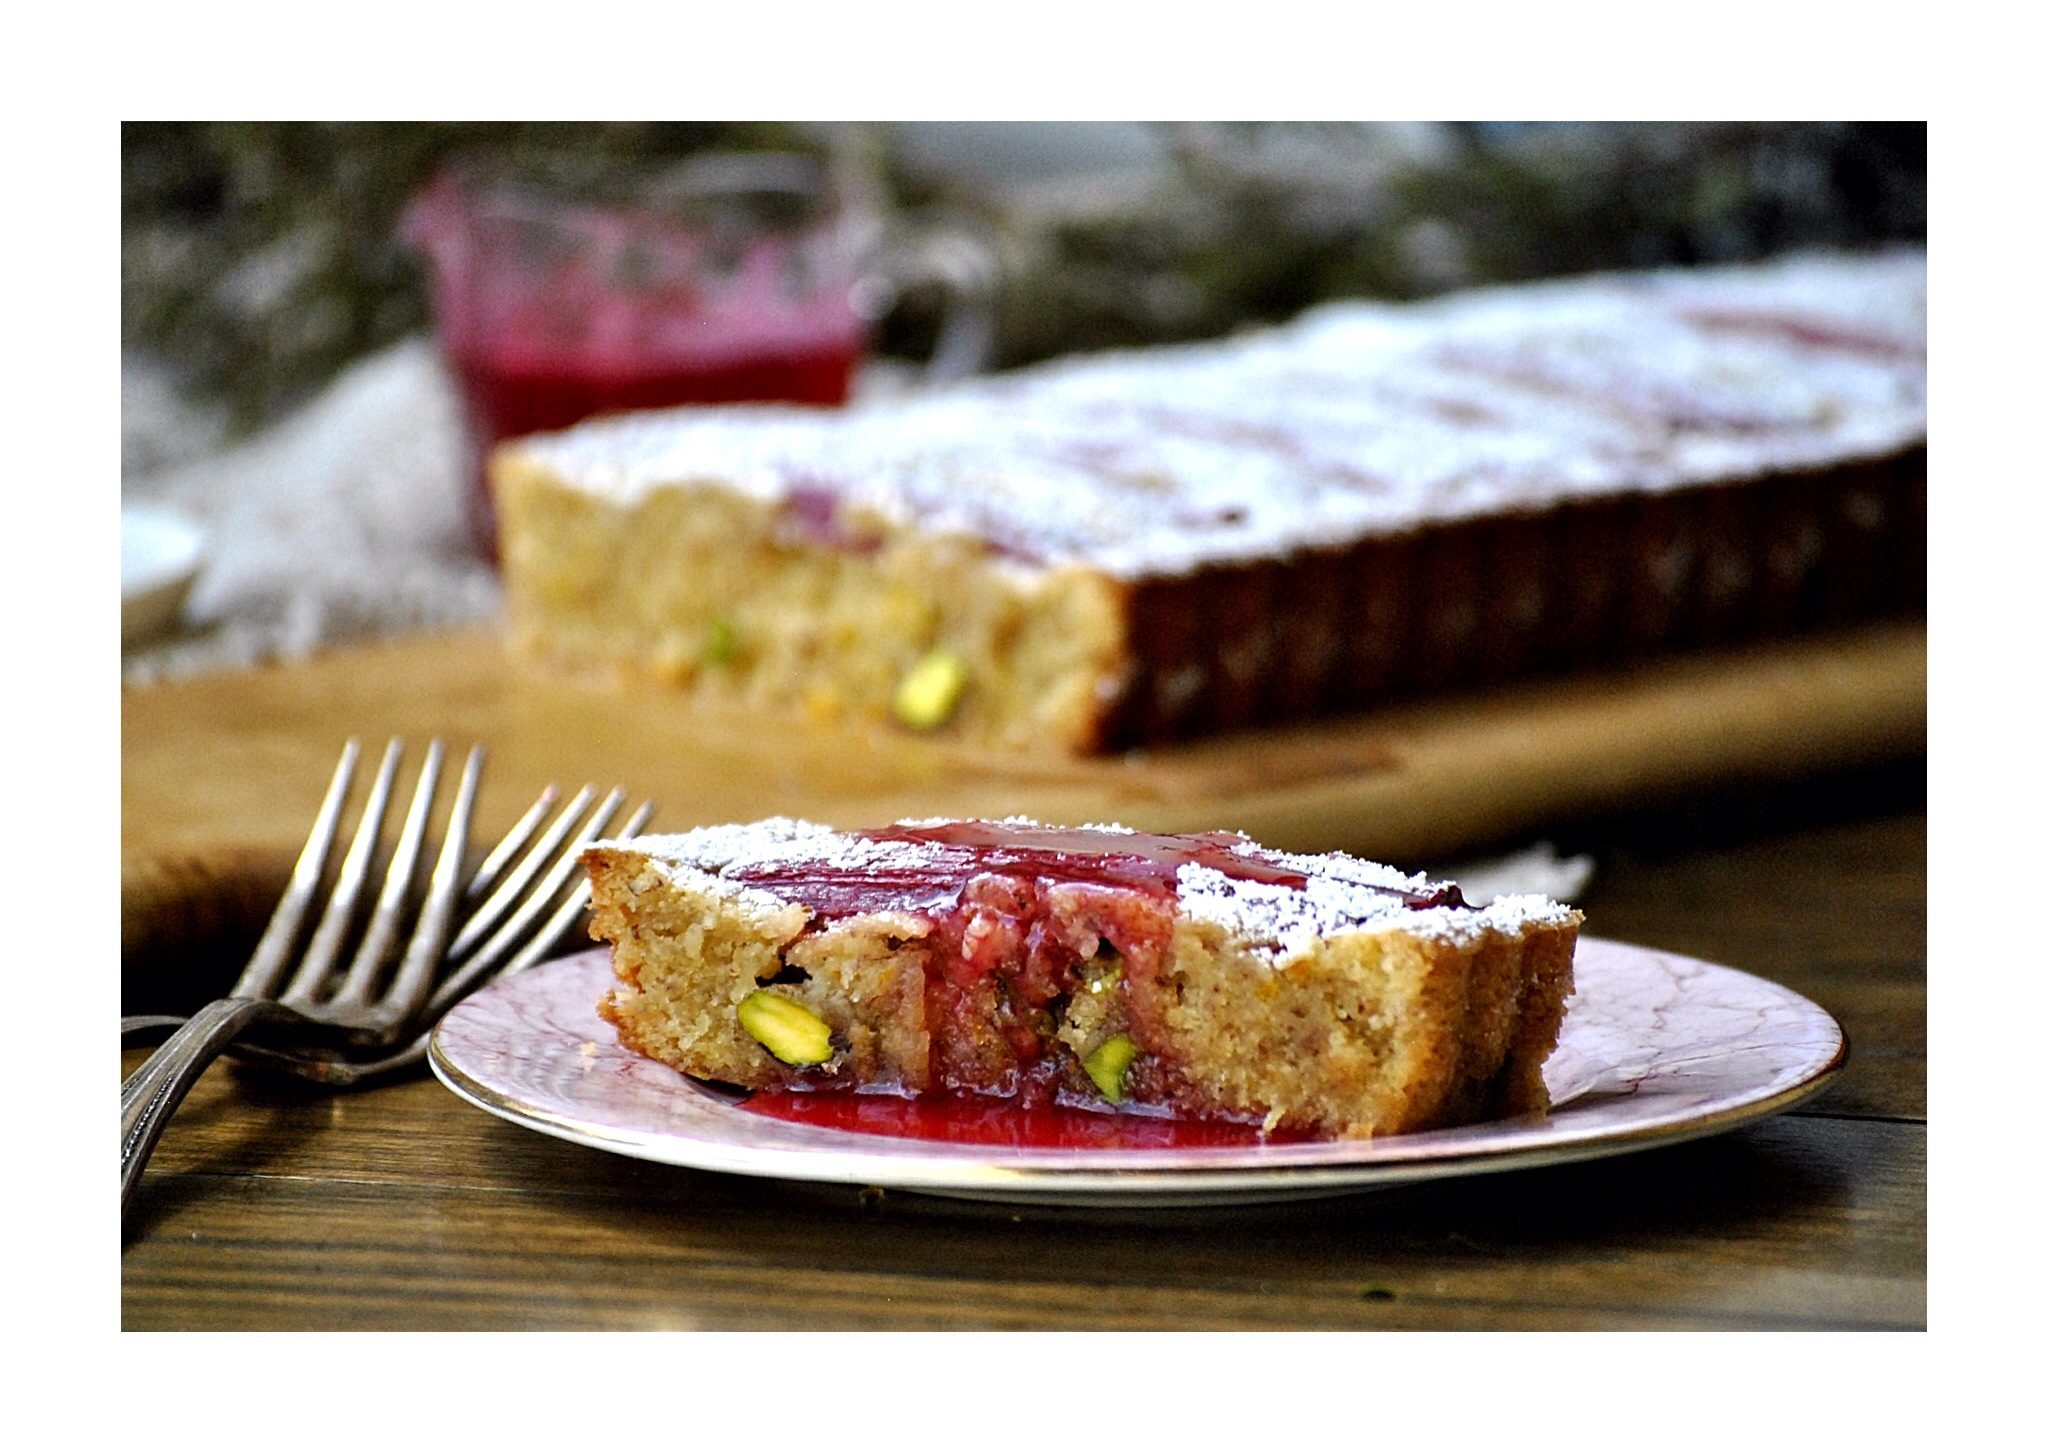 Rhubarb, pistachio and orange tart